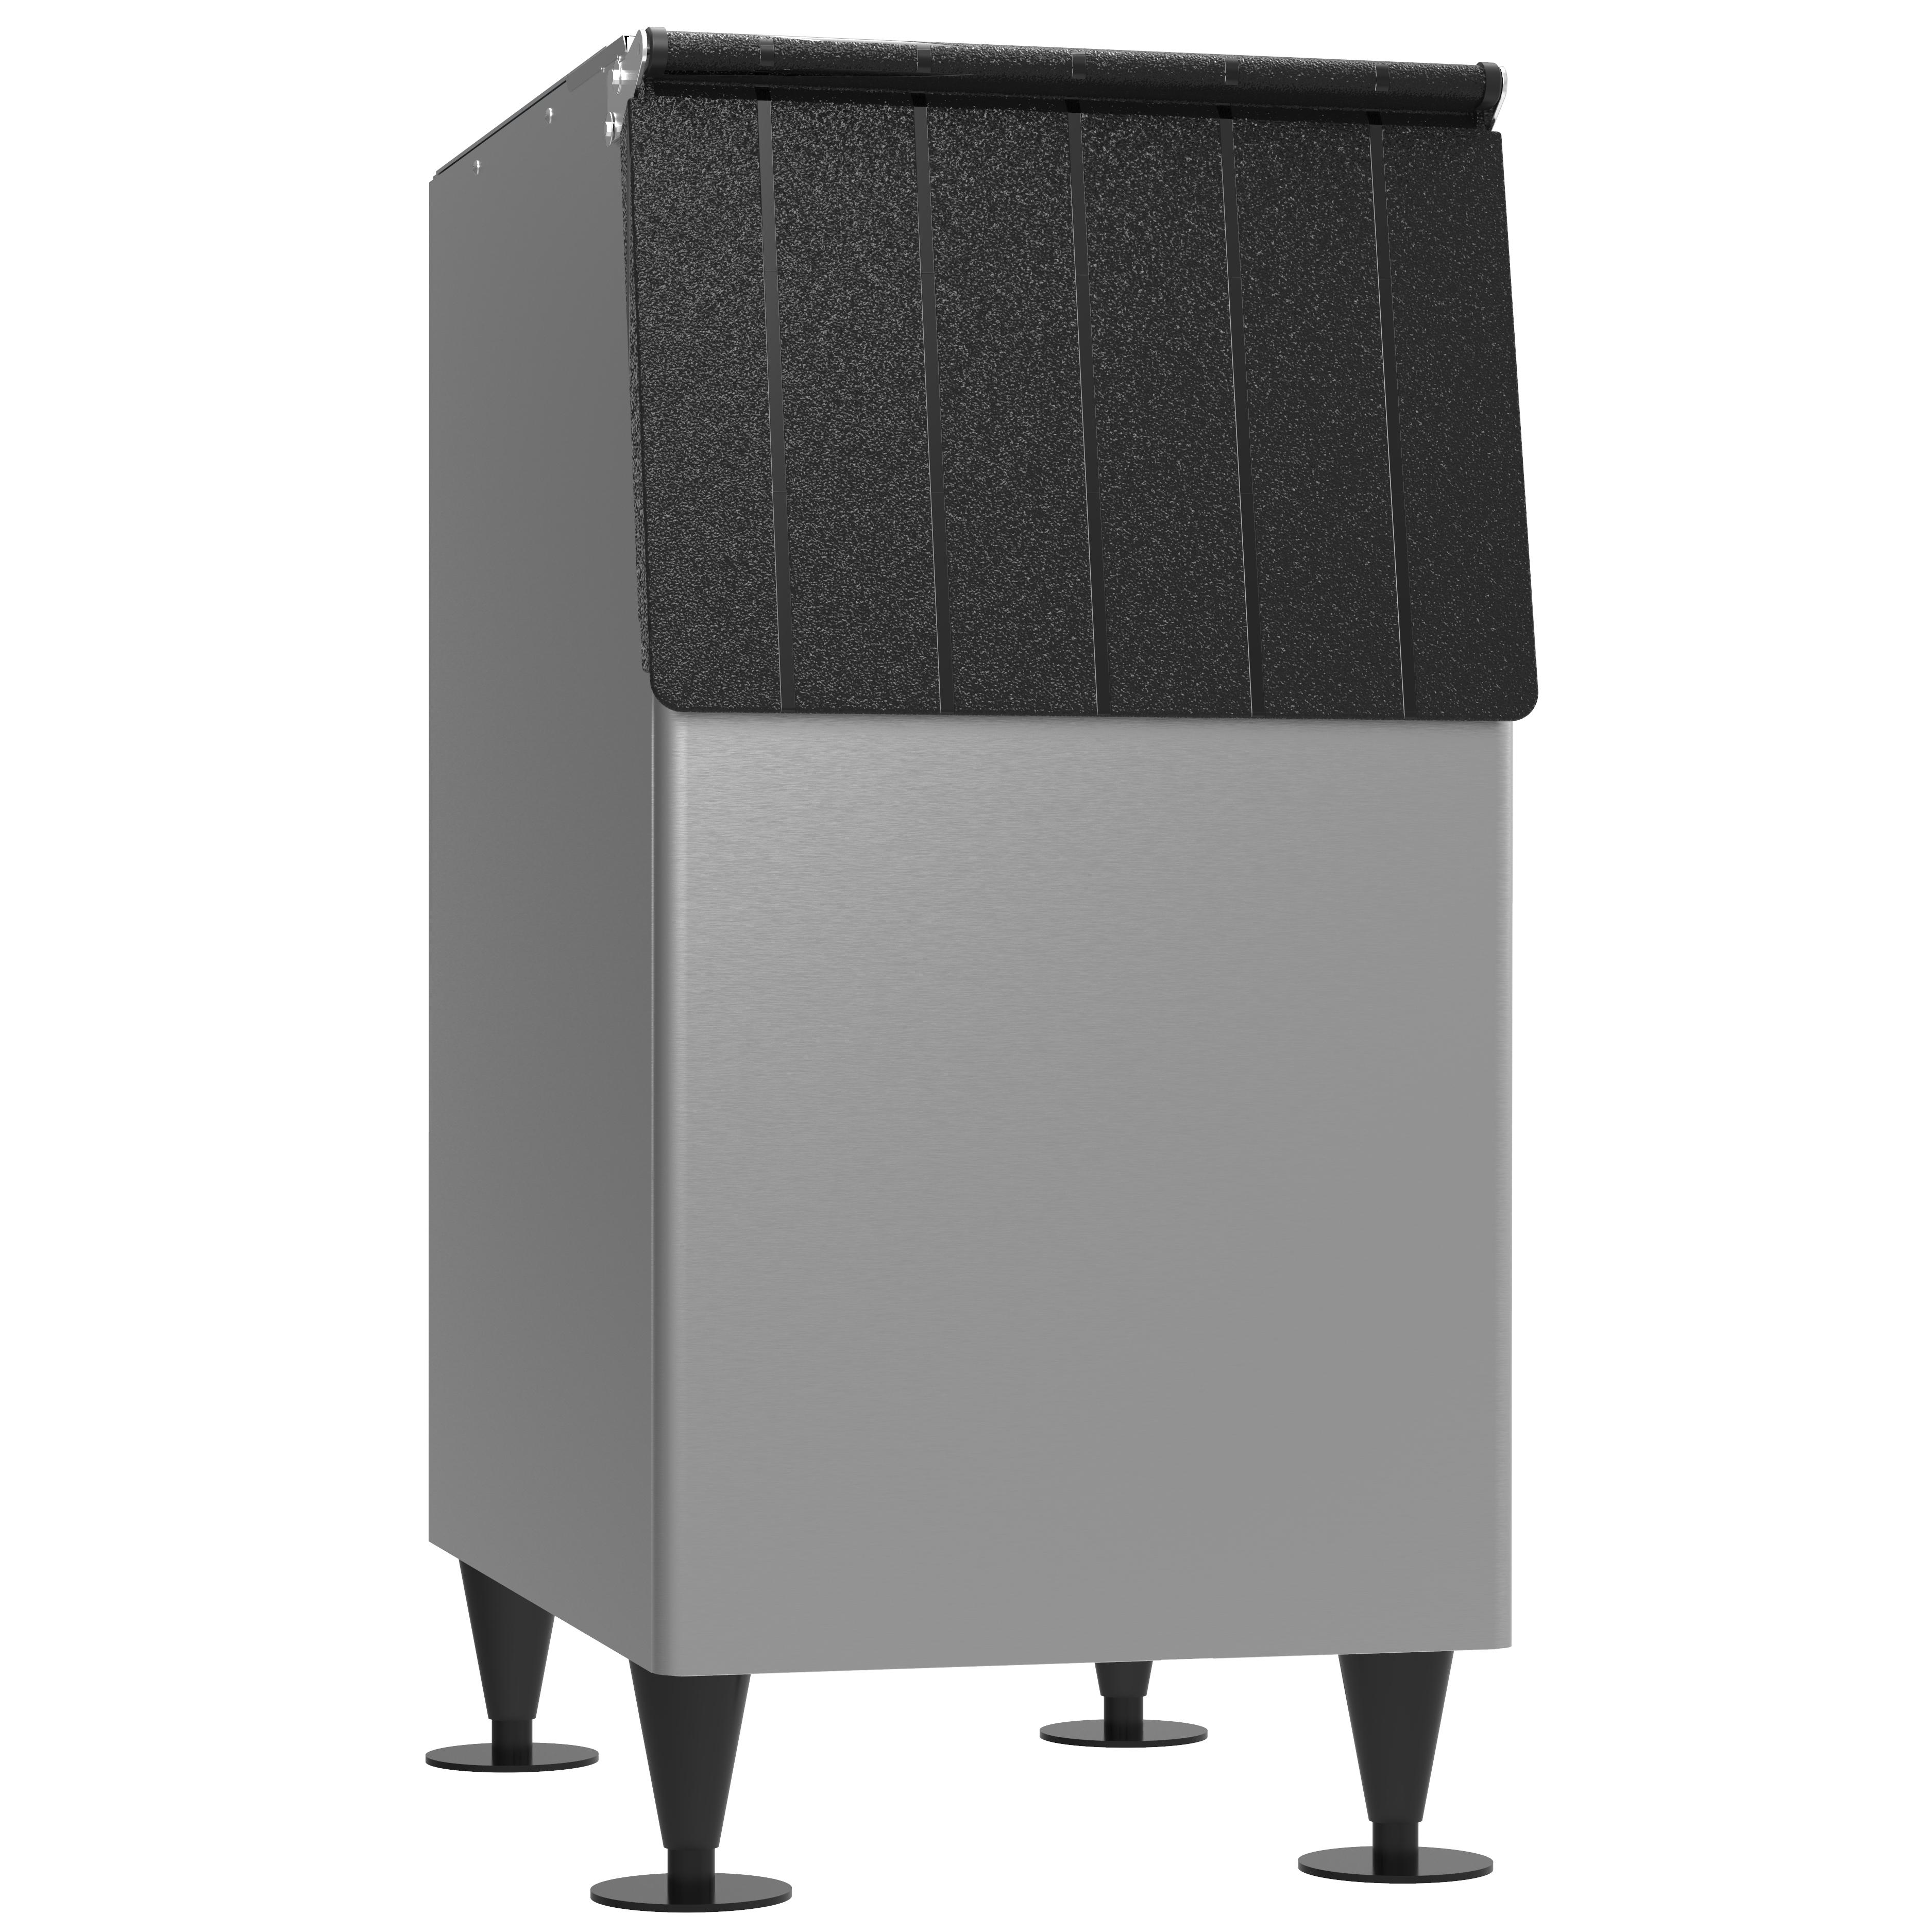 Hoshizaki BD-300PF ice cubers, ice storage & ice dispensers